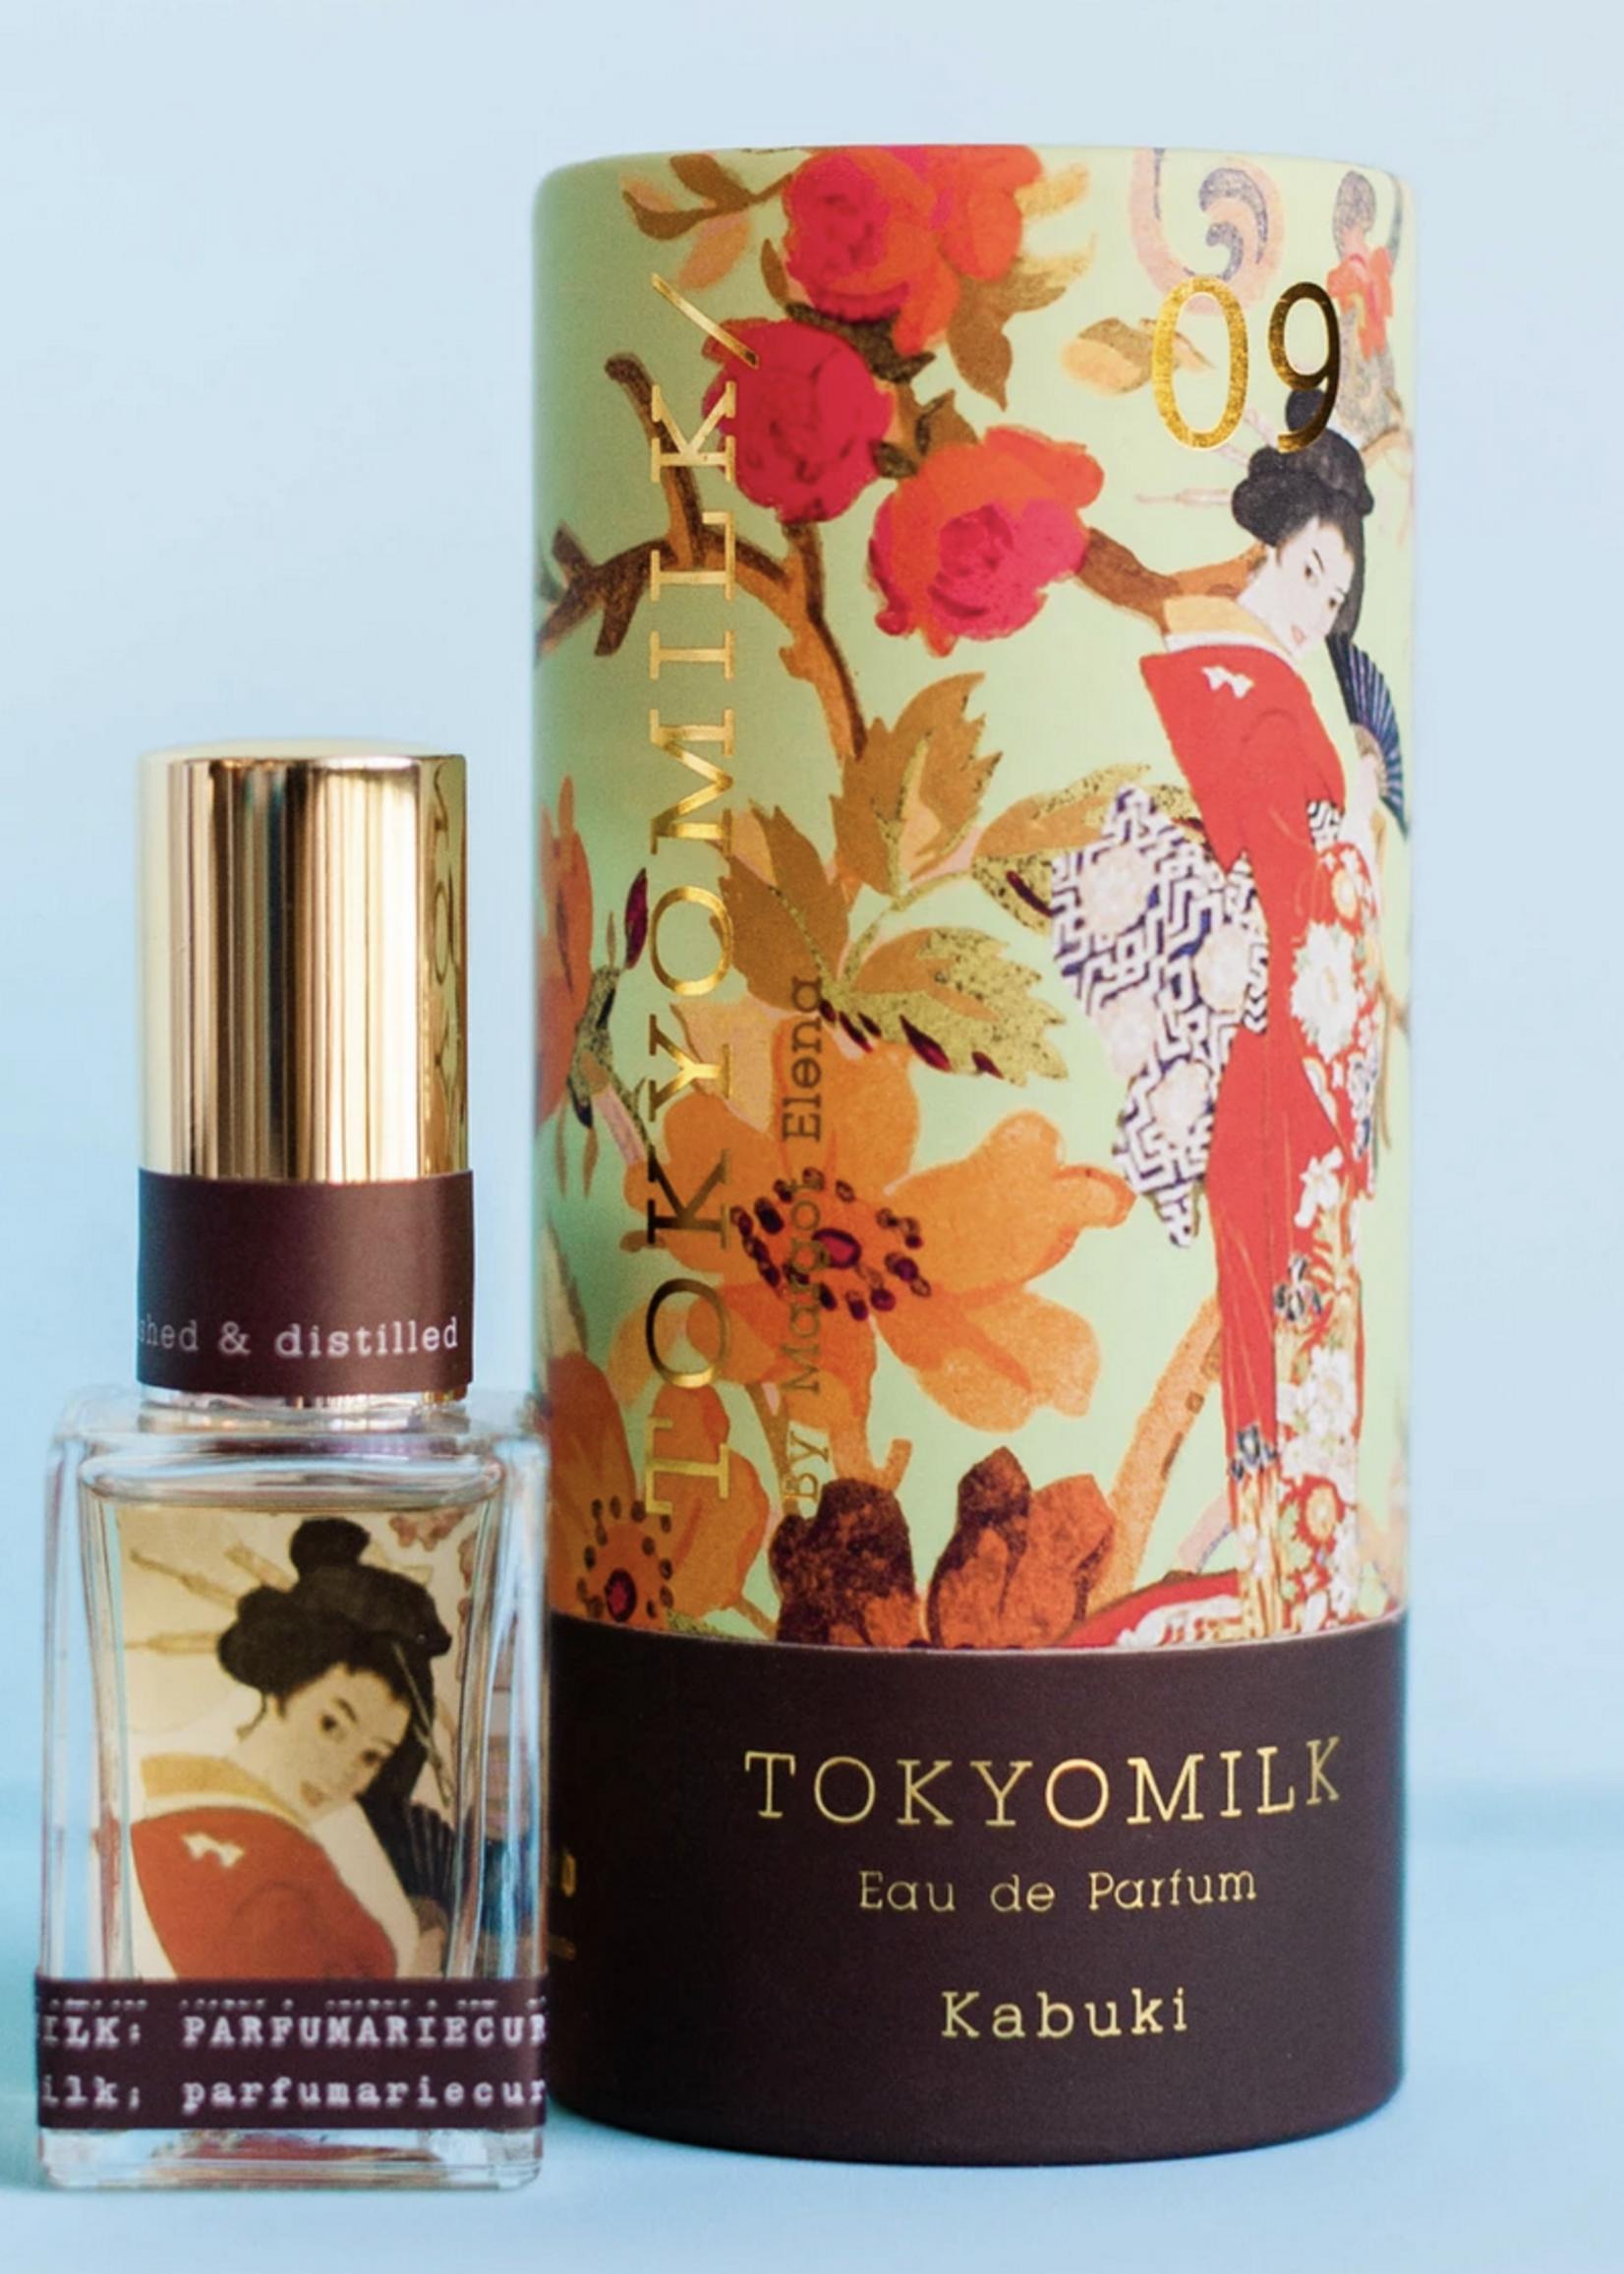 tokyo milk tokyo milk kabuki #9 boxed